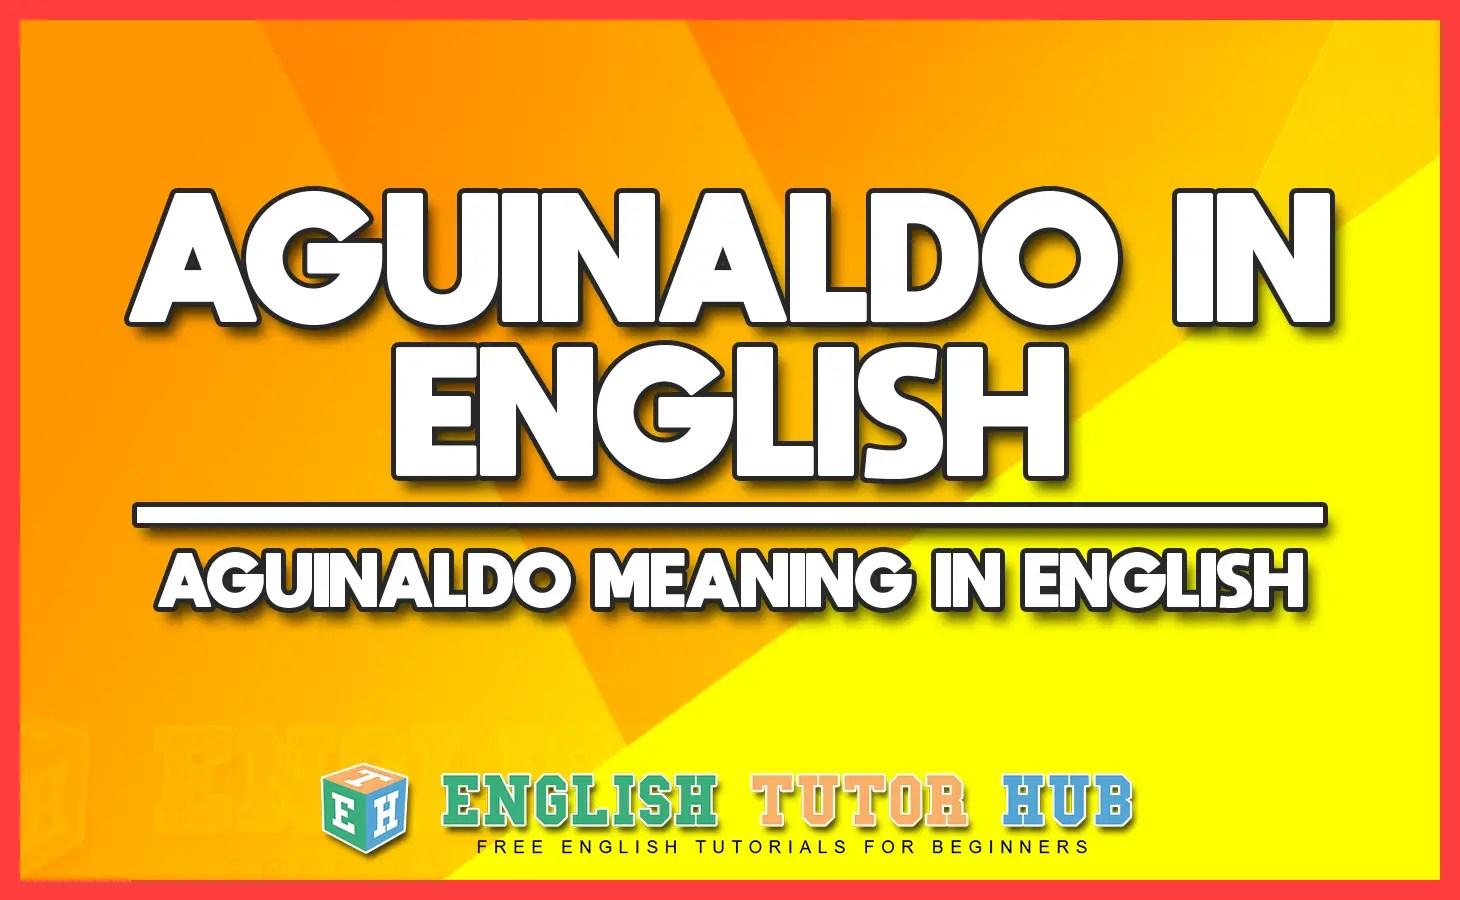 AGUINALDO IN ENGLISH - AGUINALDO MEANING IN ENGLISH